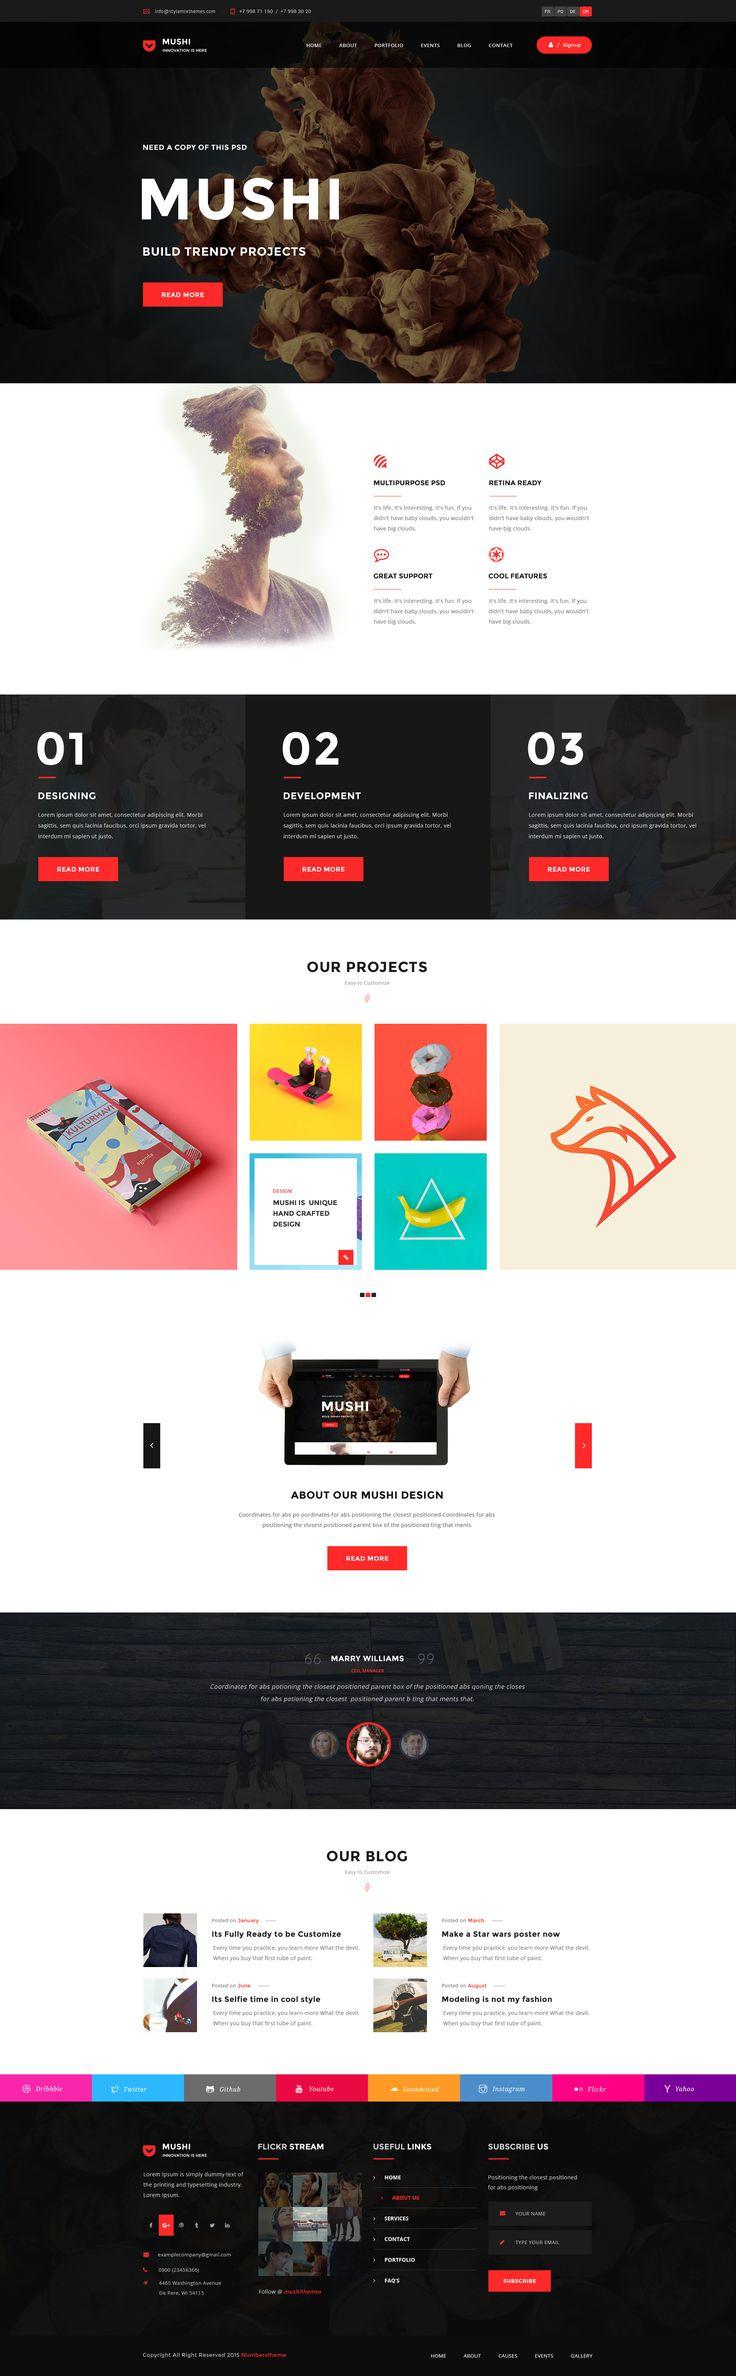 multipurpose psd template mushi website ideaswebsite designspsd templates simple - Simple Website Design Ideas